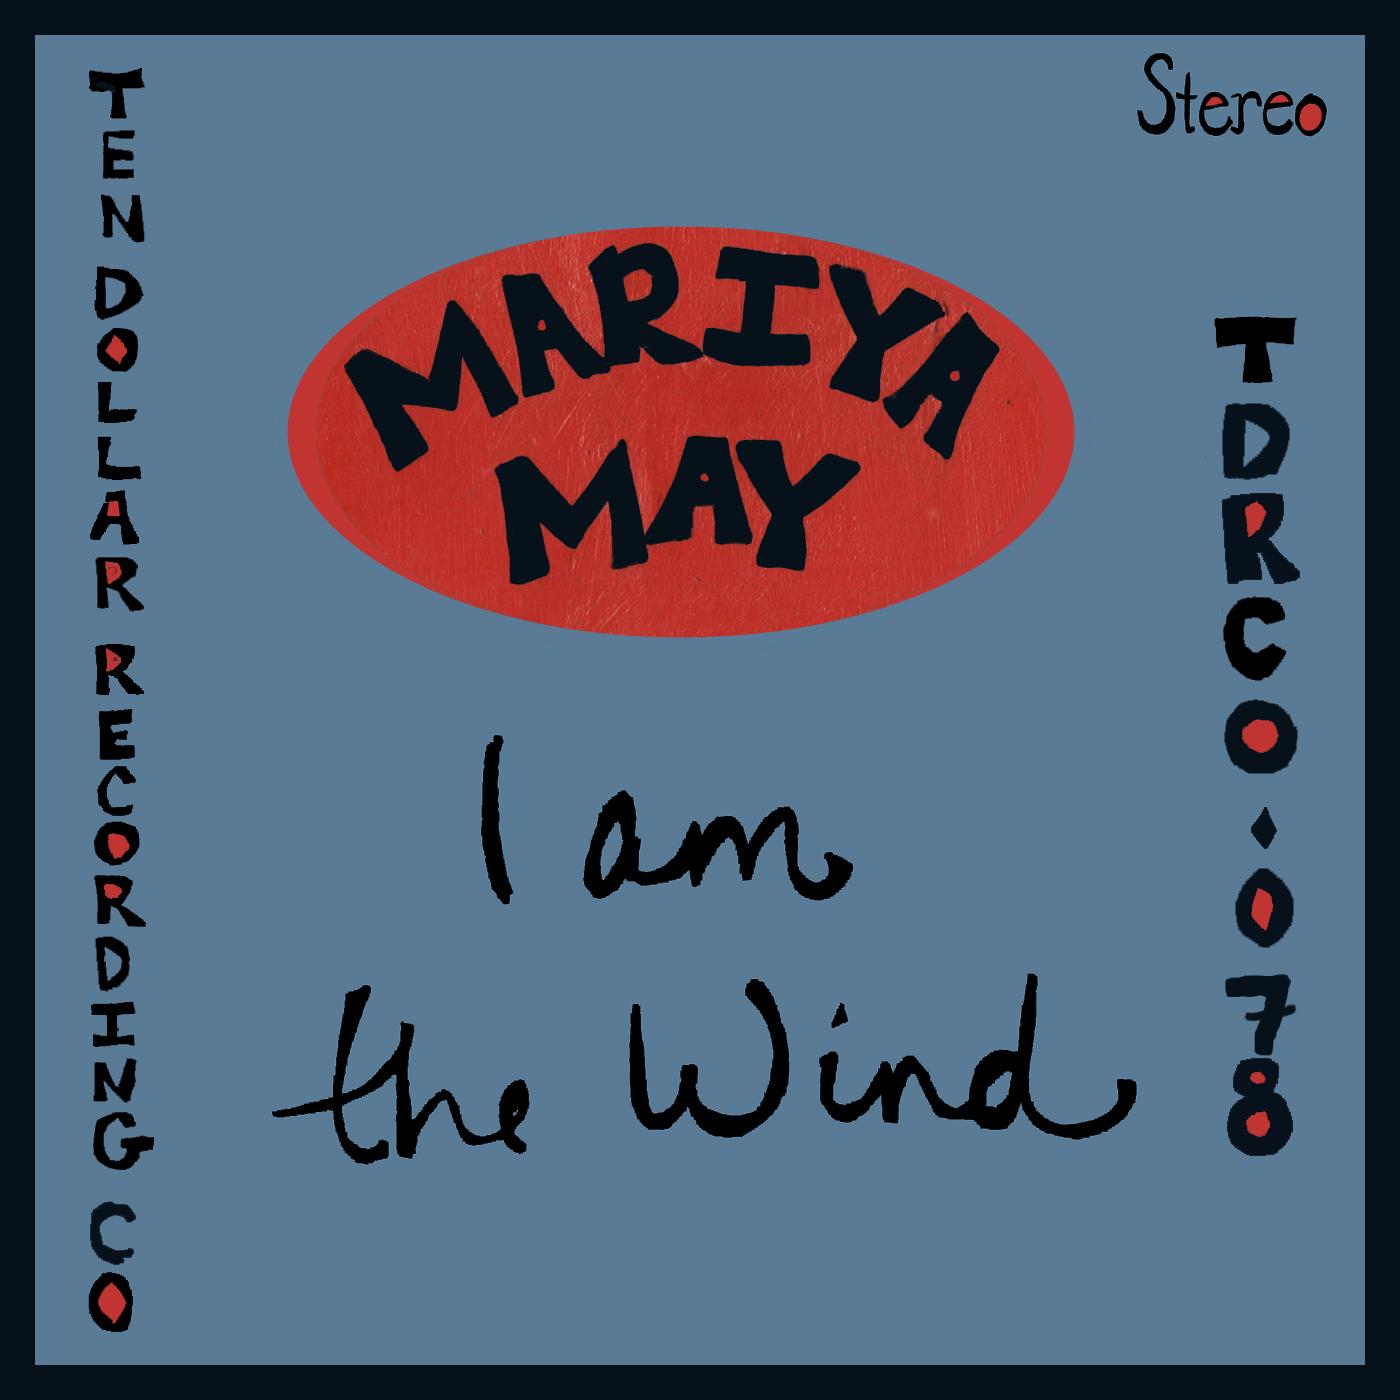 Mariya May - I Am The Wind (Single)